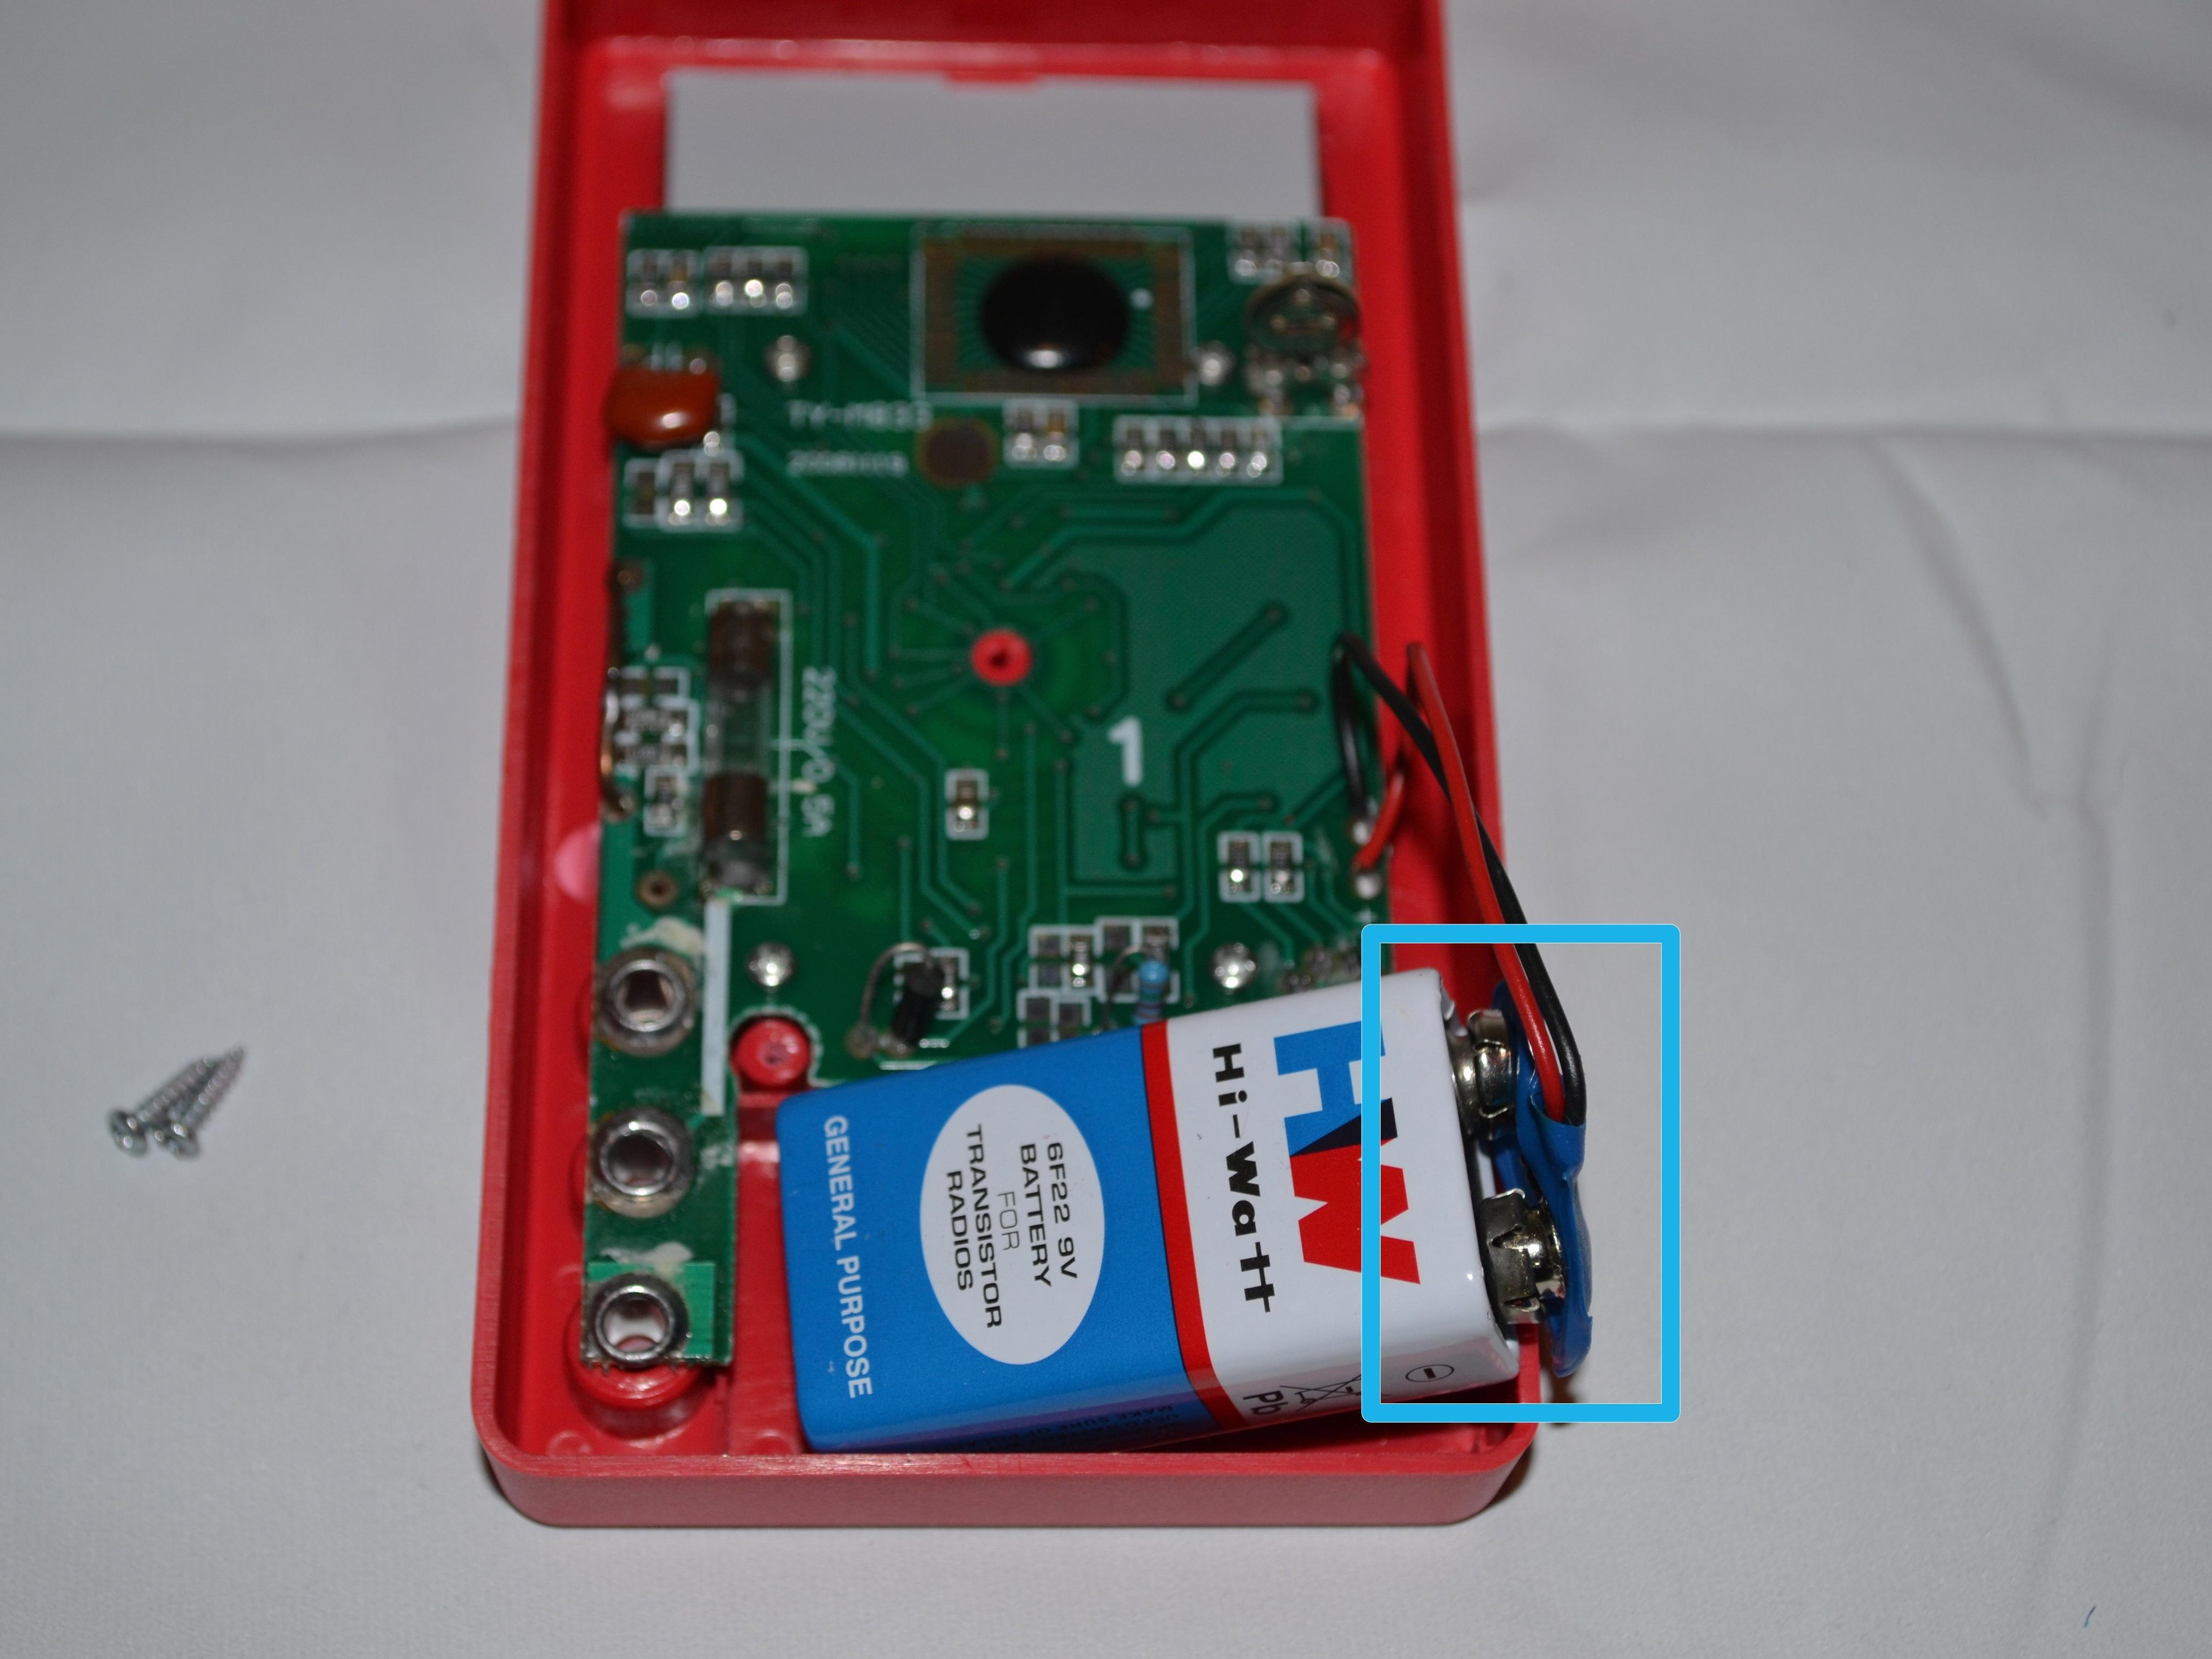 Cen Tech Digital Clamp Meter : Cen tech multimeter instruction manual wiring diagrams